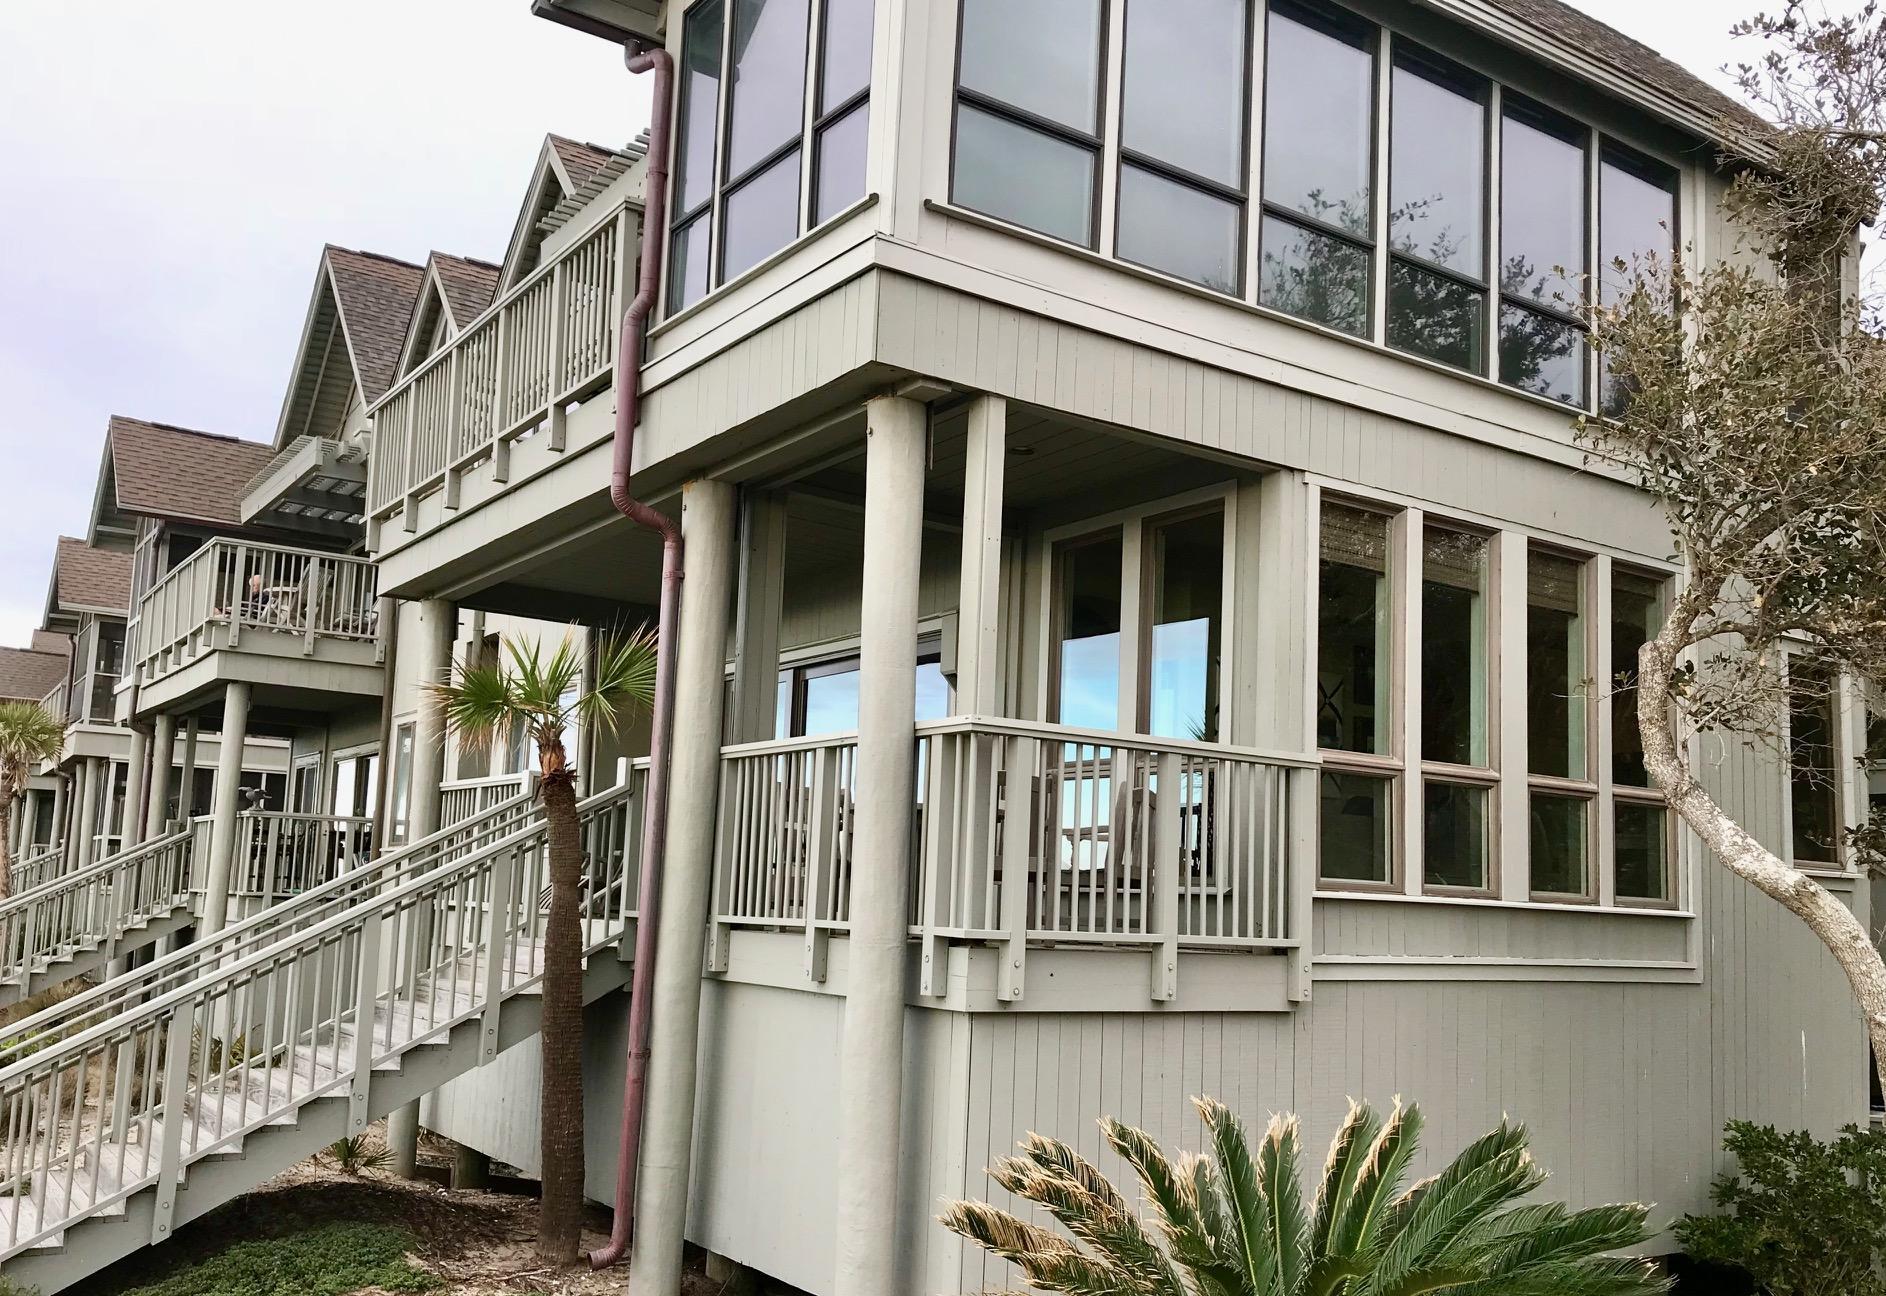 Kiawah Island Homes For Sale - 4200 Mariners Watch, Kiawah Island, SC - 10